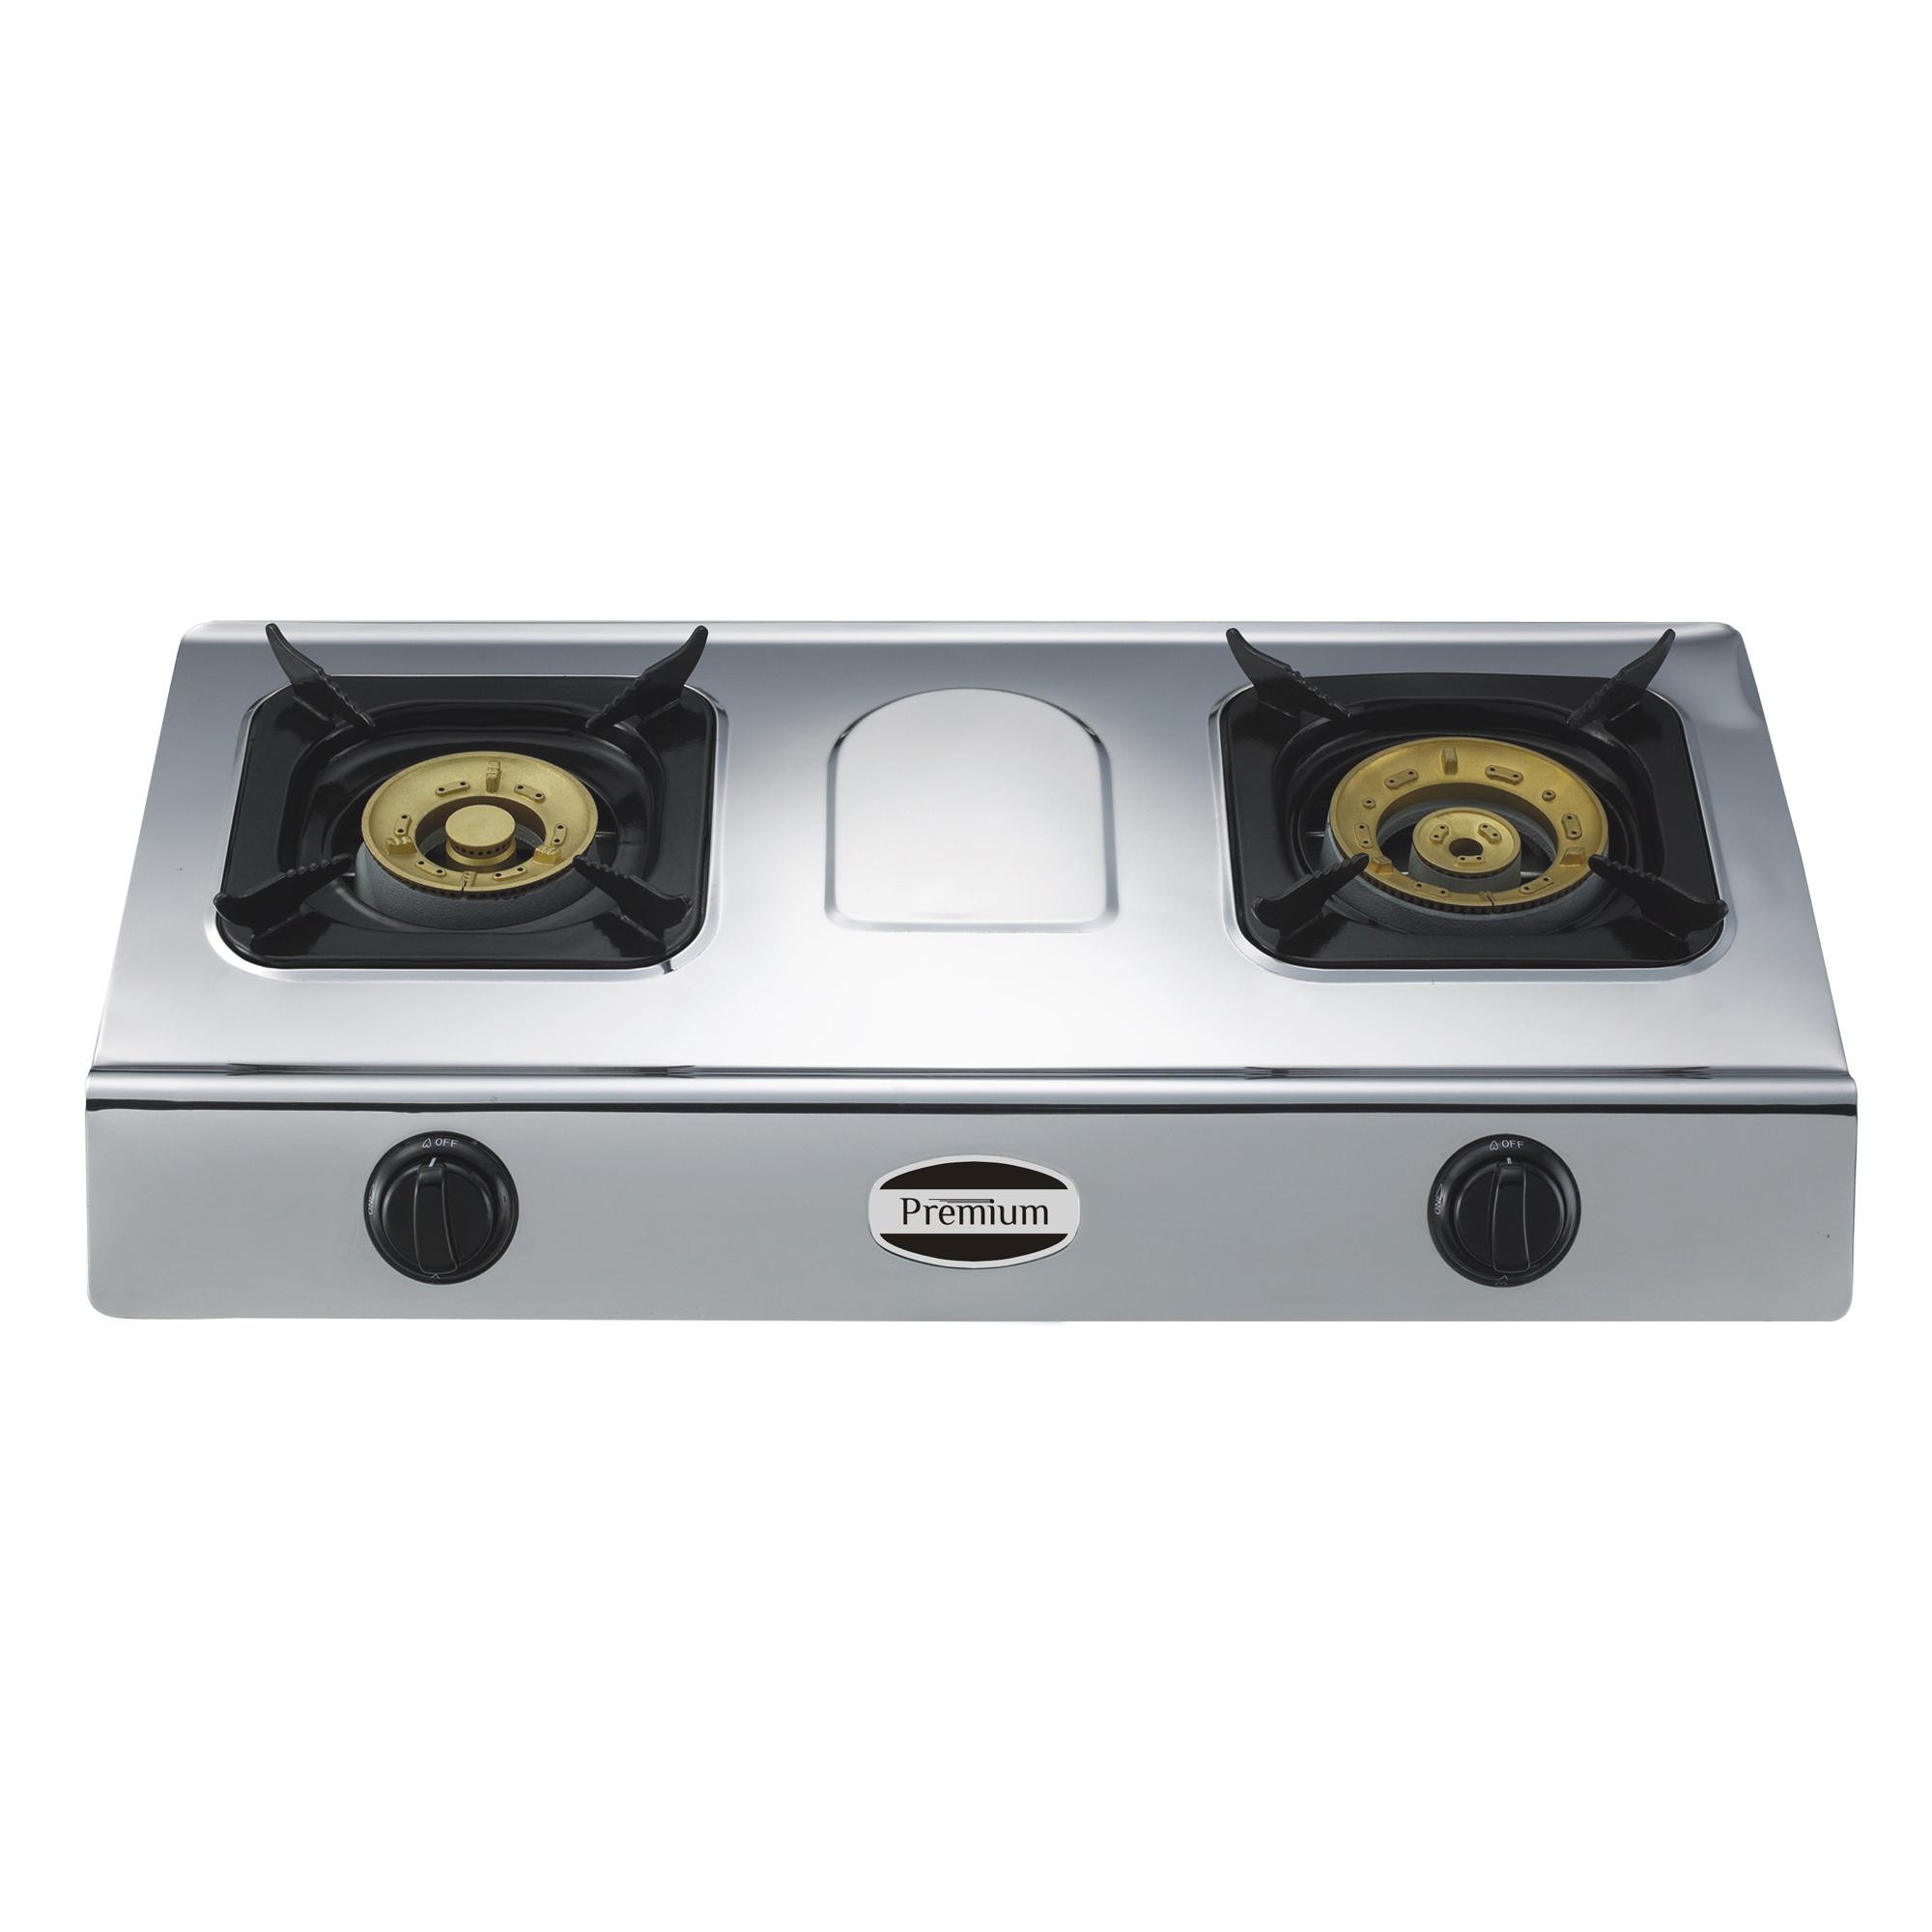 premium appliances deluxe portable gas stove. Black Bedroom Furniture Sets. Home Design Ideas